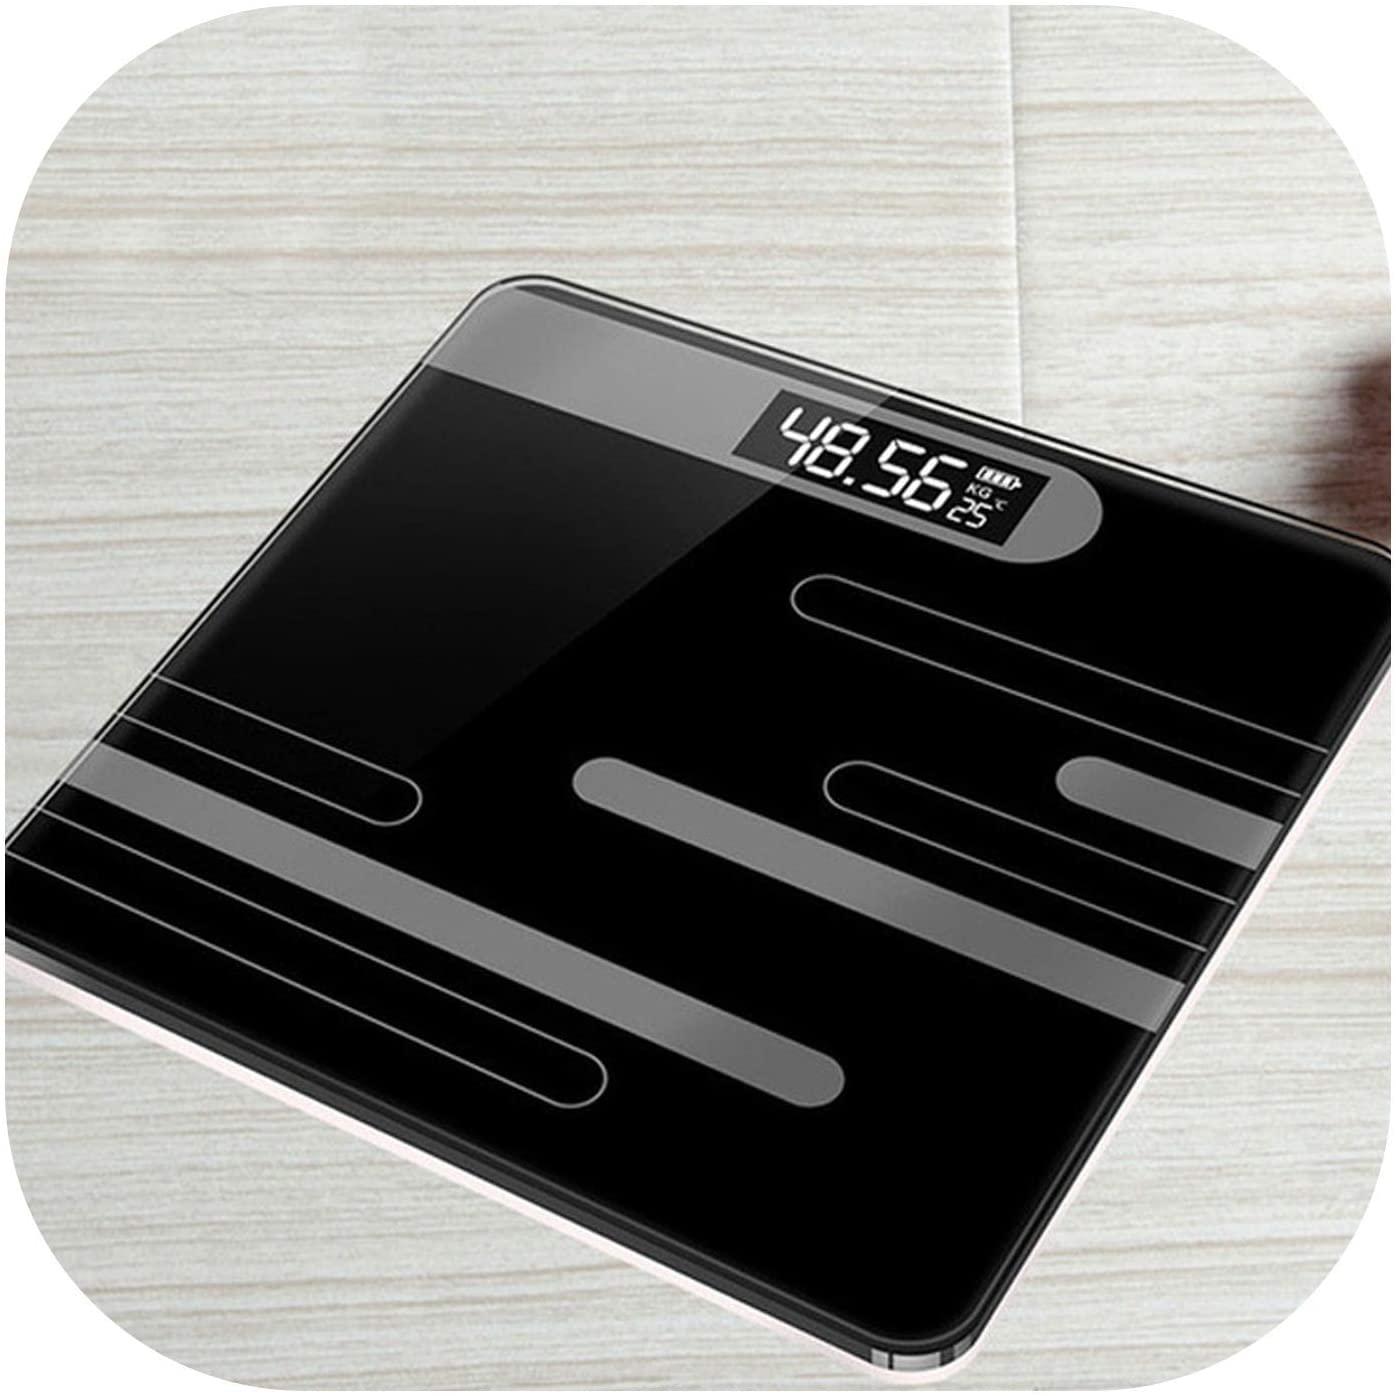 180kg Bathroom Glass Smart Electronic Scales USB Charging,Black